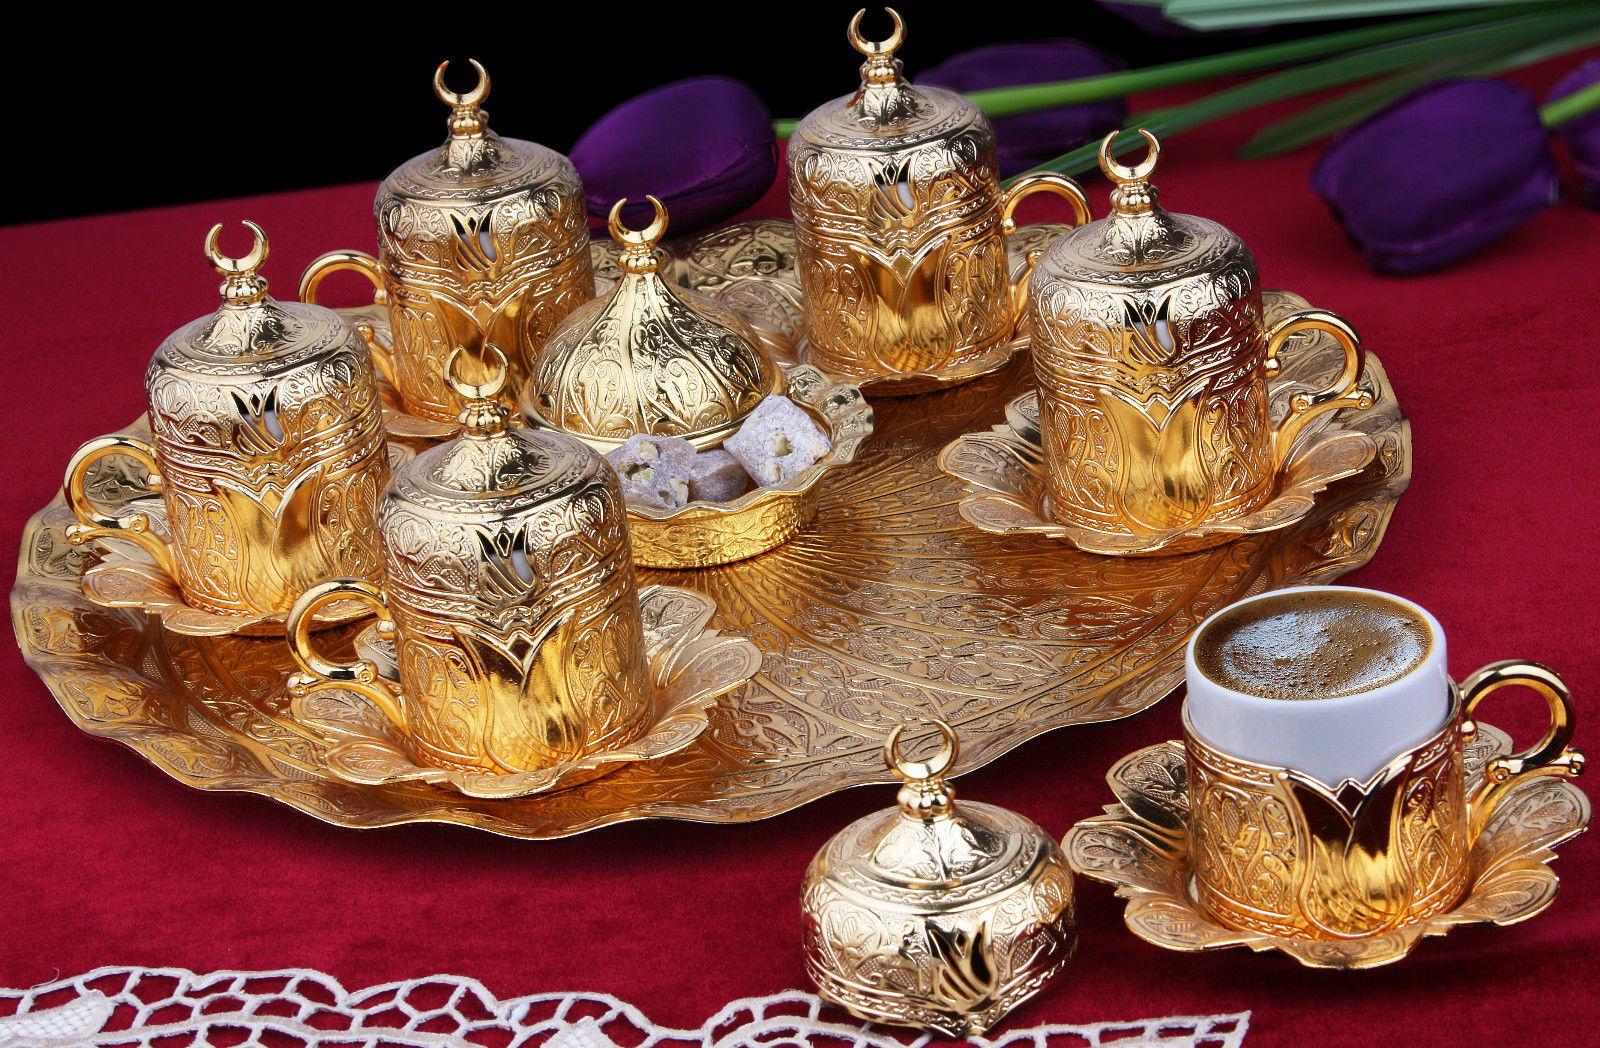 27 Pieces Copper Turkish Greek Arabic CoffeeEspresso Serving Set Cup Saucer Gift